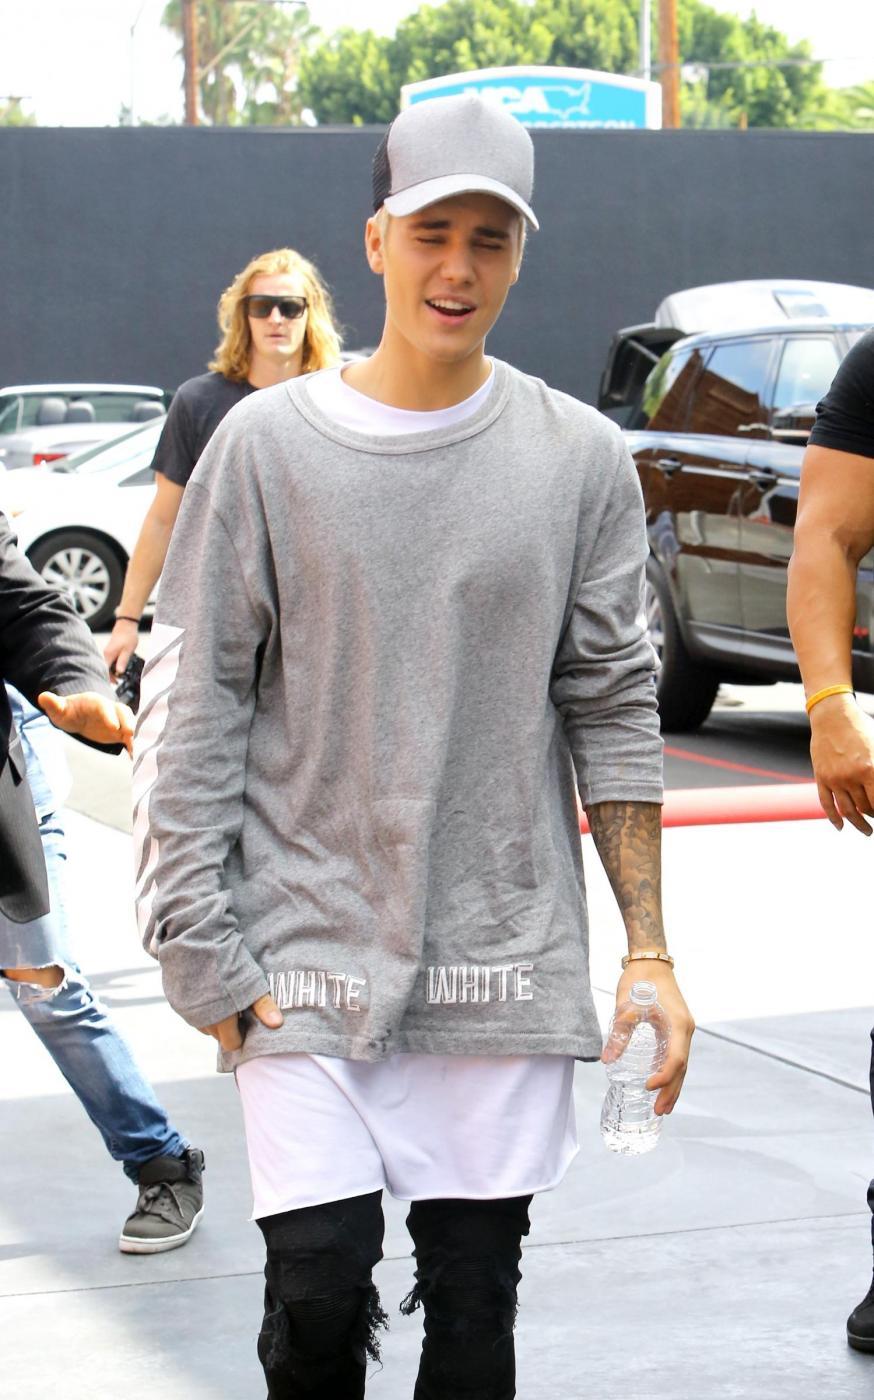 Justin Bieber e James Corden insieme a Los Angeles FOTO 1